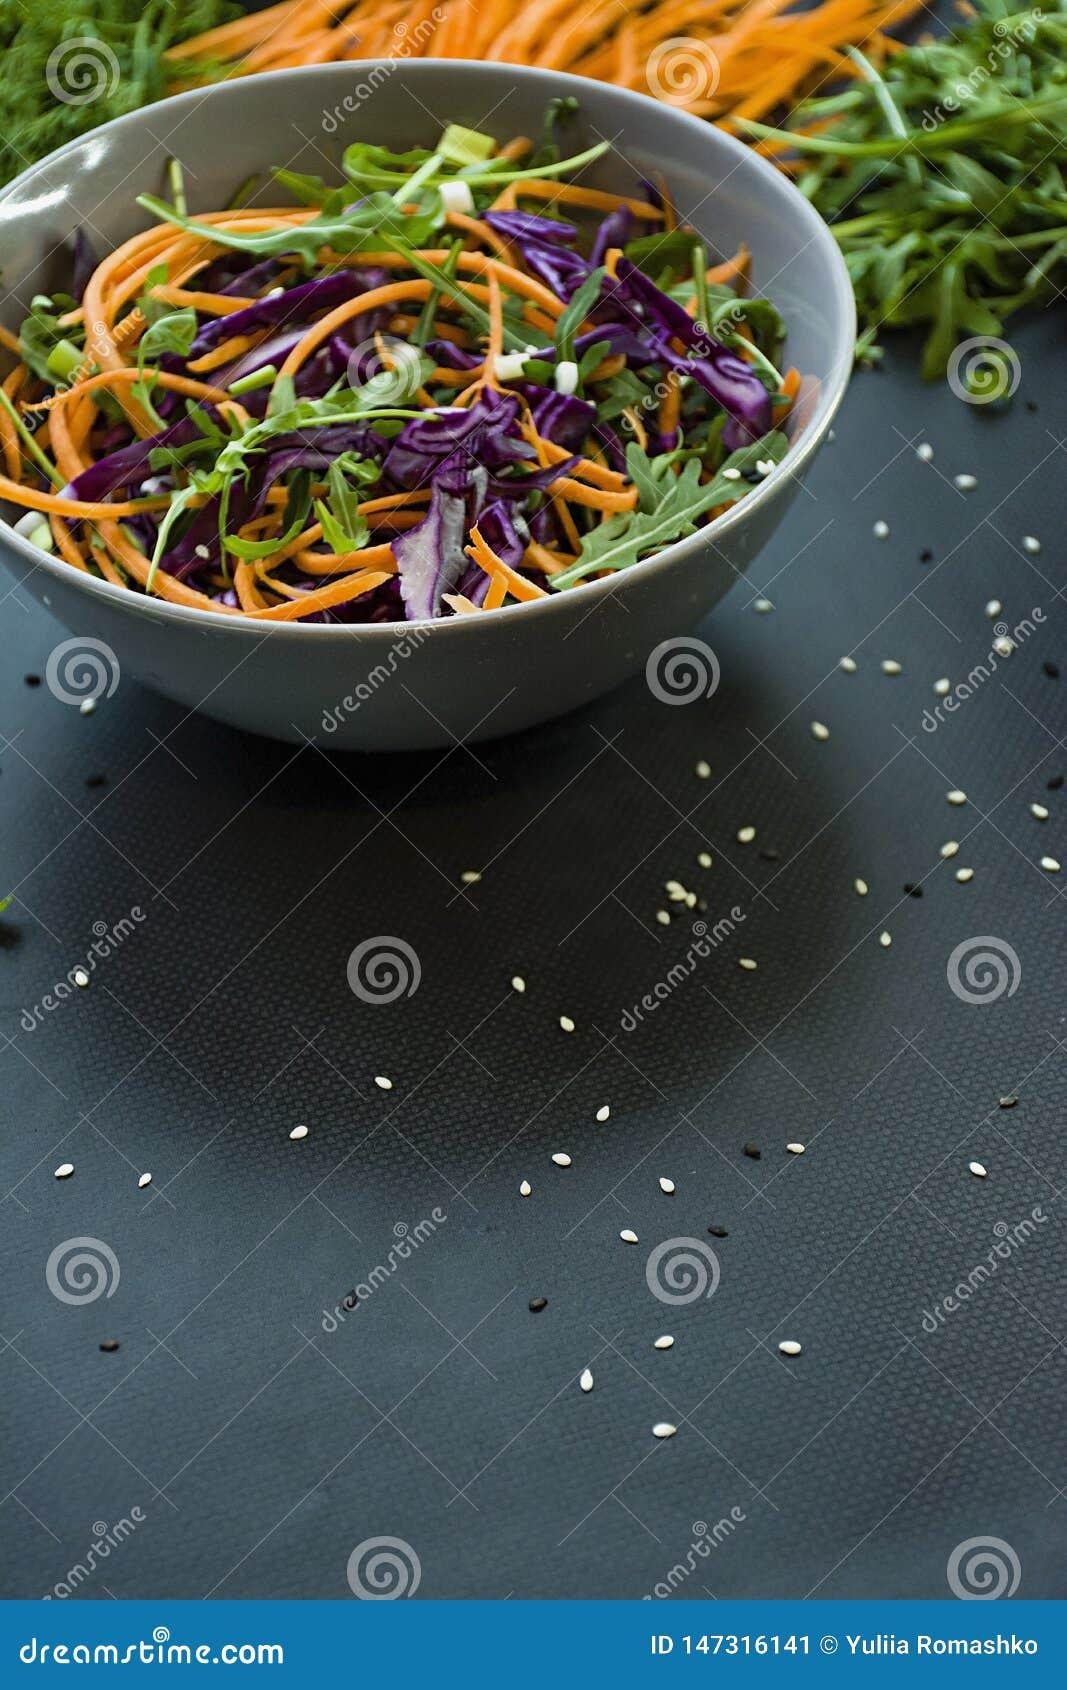 Salada da couve vermelha, das cenouras e dos verdes Decorado com vegetais e as ervas cortados Cortando tiras Fundo escuro